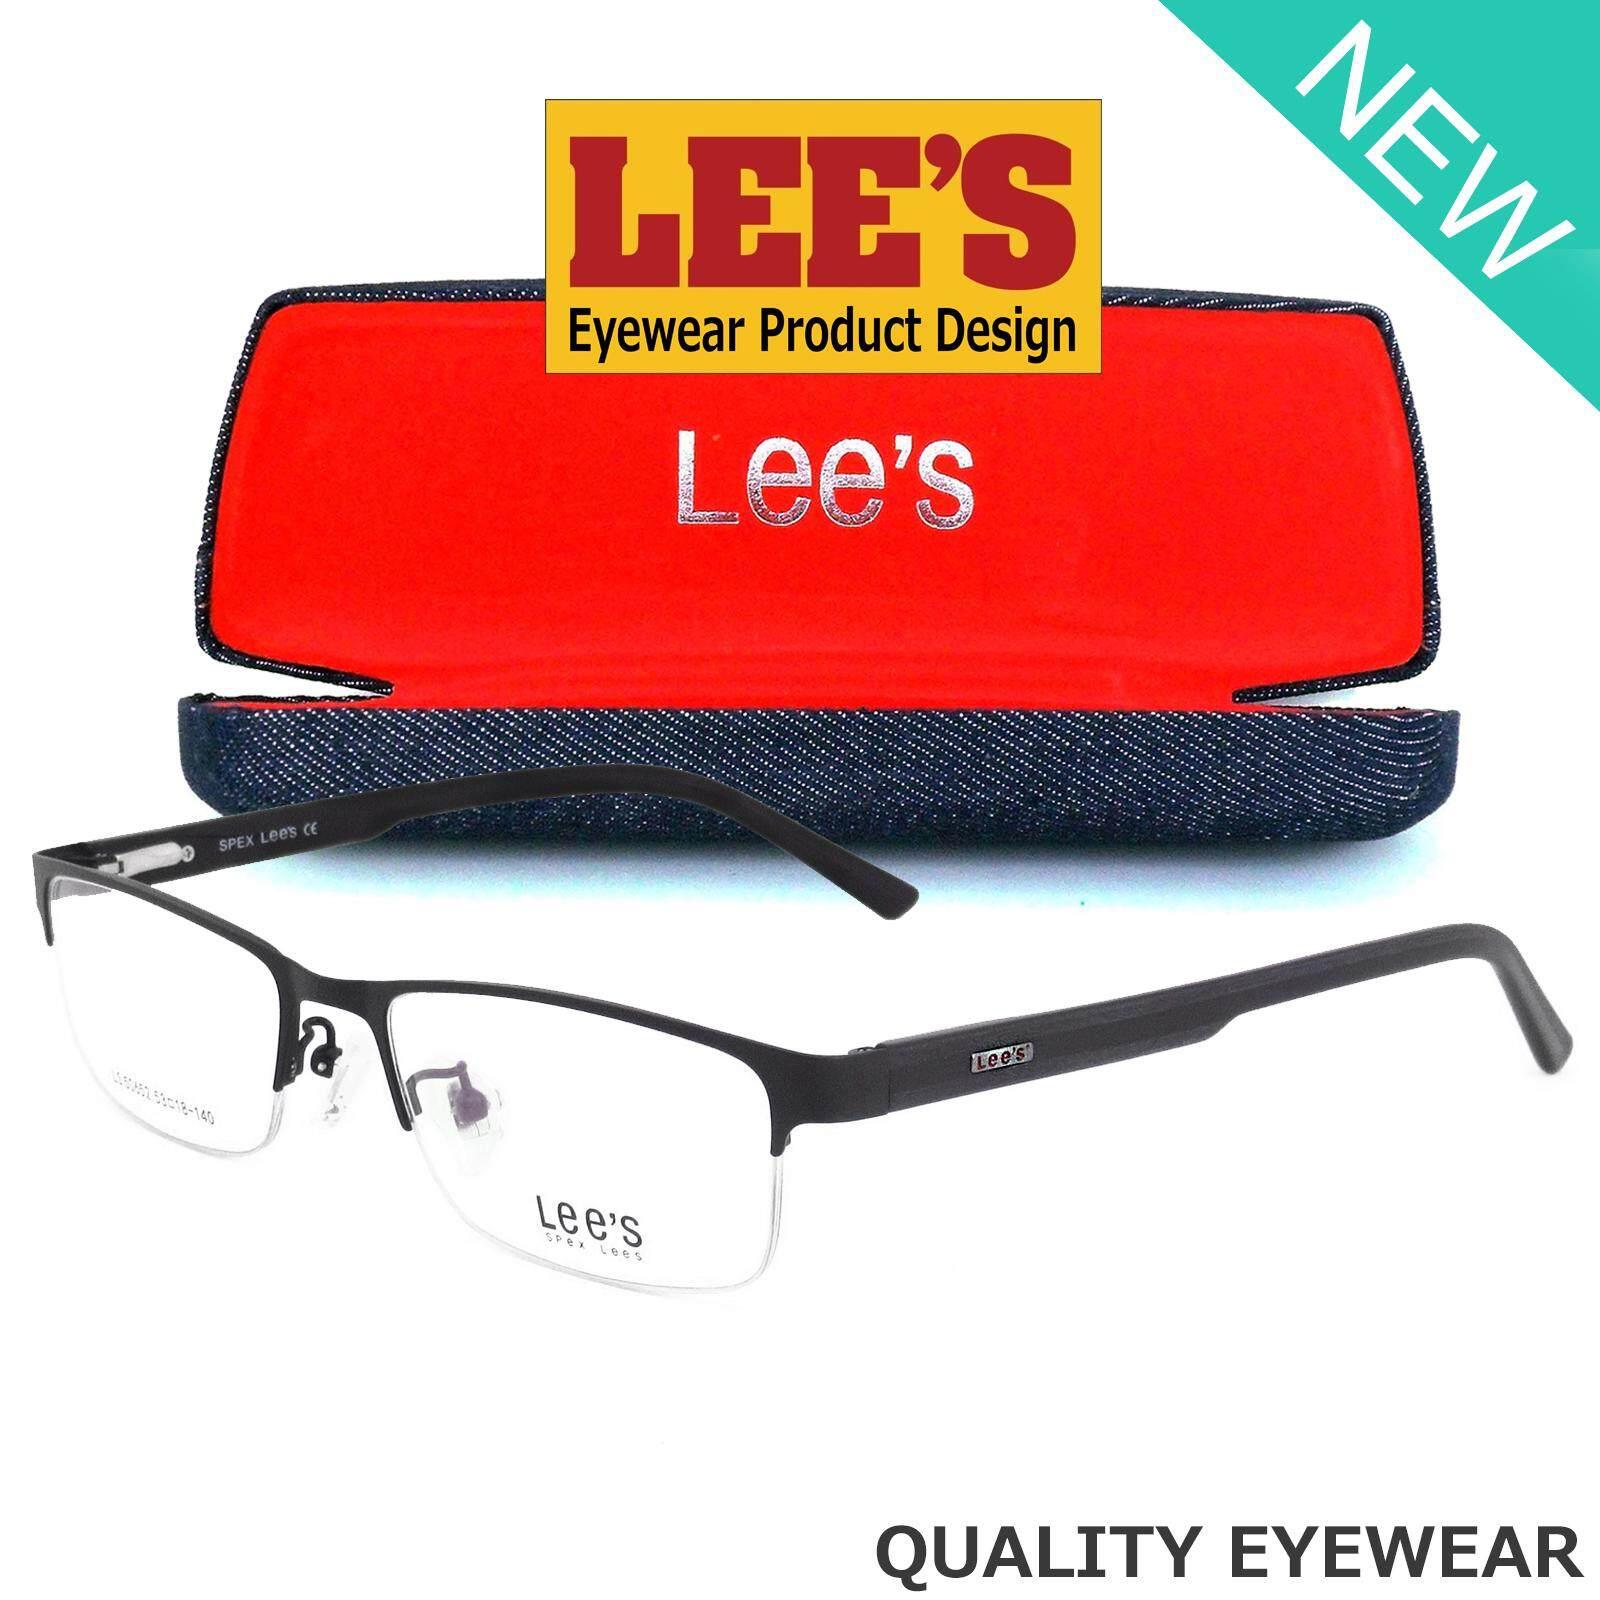 Lee's แว่นตา รุ่น 50652 C-1 สีดำ กรอบเซาะร่อง Rectangle ทรงสี่เหลี่ยมผืนผ้า ขาสปริง วัสดุ สแตนเลส สตีล (สำหรับตัดเลนส์) กรอบแว่นตา สวมใส่สบาย น้ำหนักเบา มีความแข็งแรงทนทาน Gouging frame Eyeglass Spring legs Stainless Steel material Eyewear Top Glasses